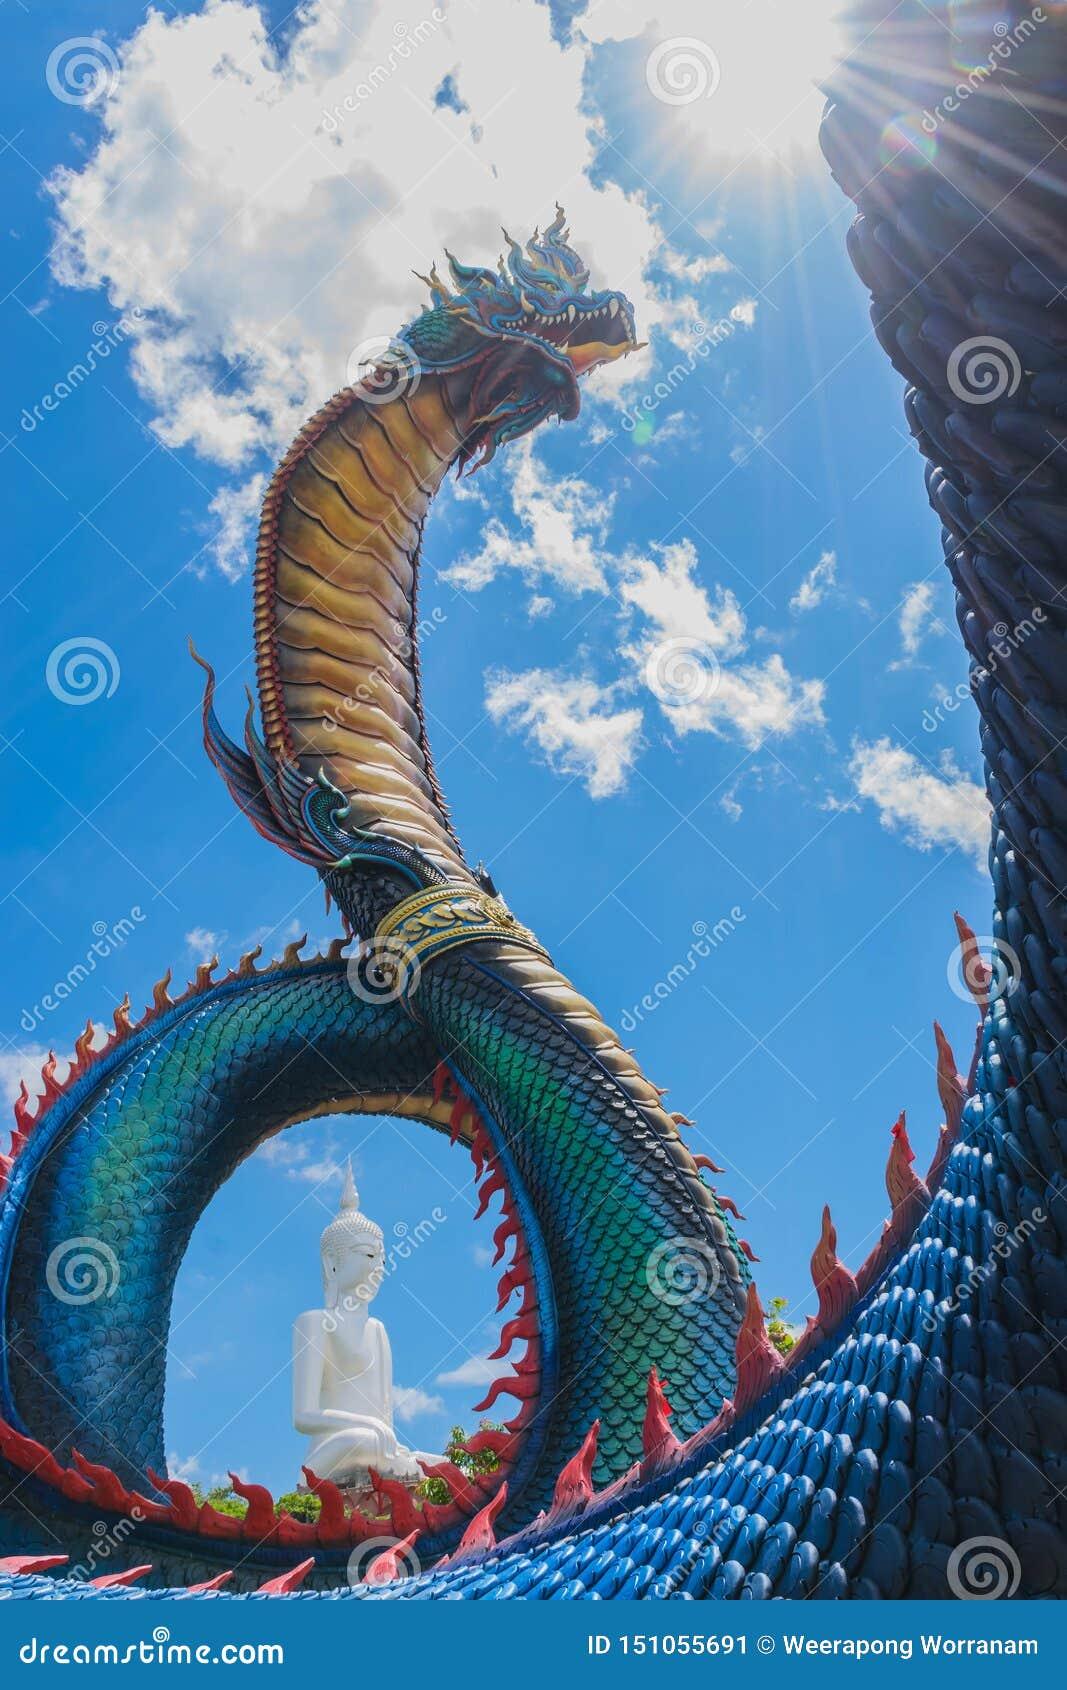 Phaya纳卡语,蛇龙的大具体标志有大菩萨背景,在Wat Phumanorom的公共资产,